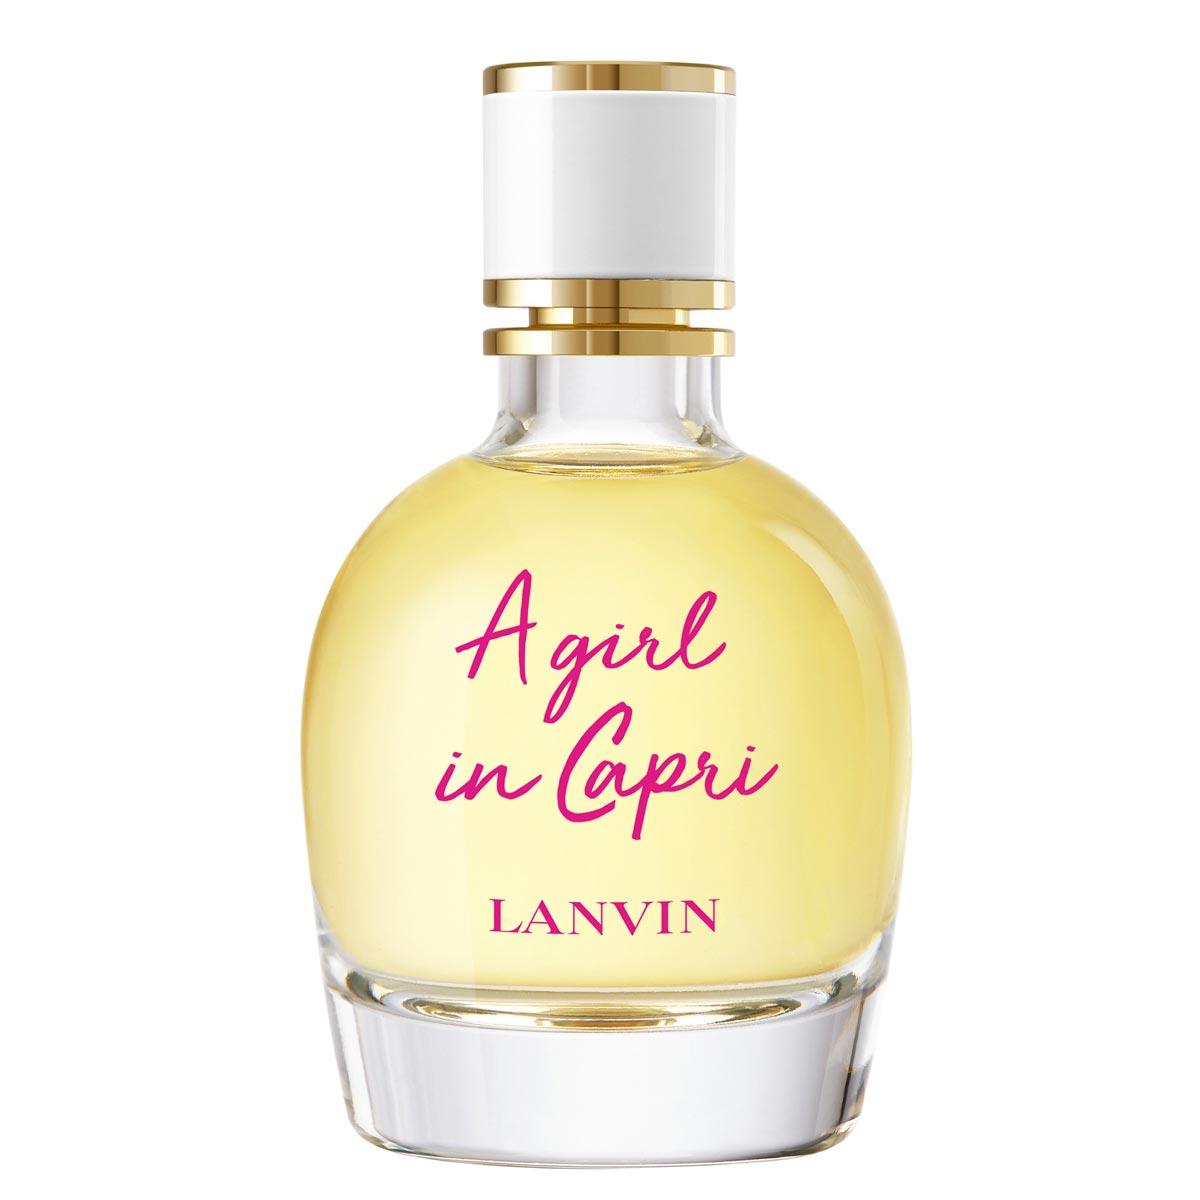 Lanvin - A Girl in Capri - Eau de Toilette